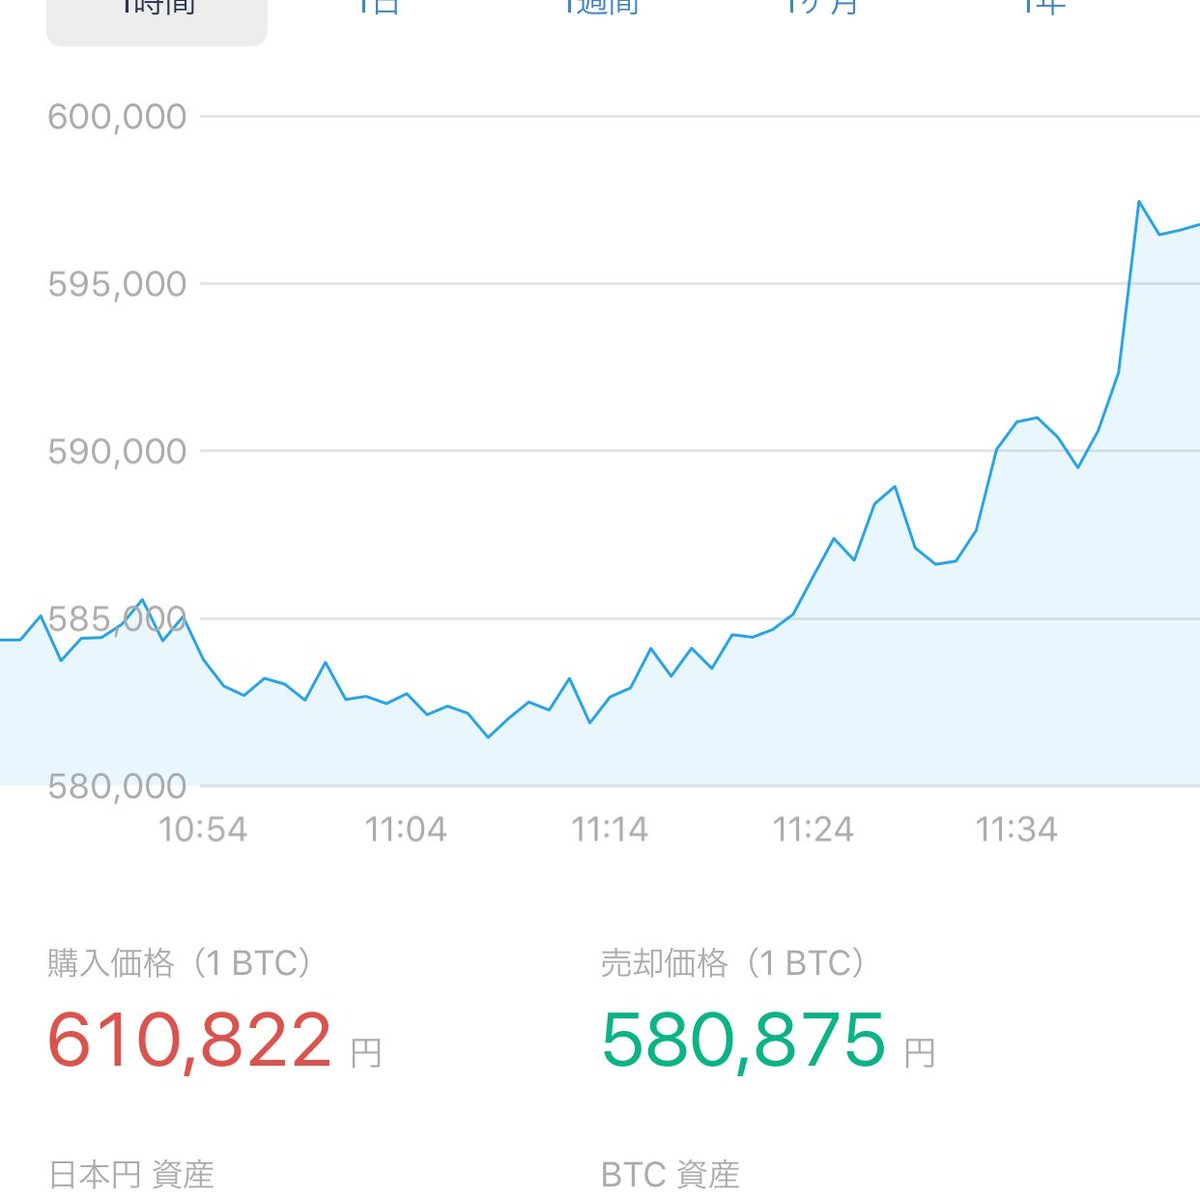 test ツイッターメディア - ビットコイン急回復❗️下落前に戻るのも時間の問題#ノアコイン #ビットコイン https://t.co/bMXYeIBg2P